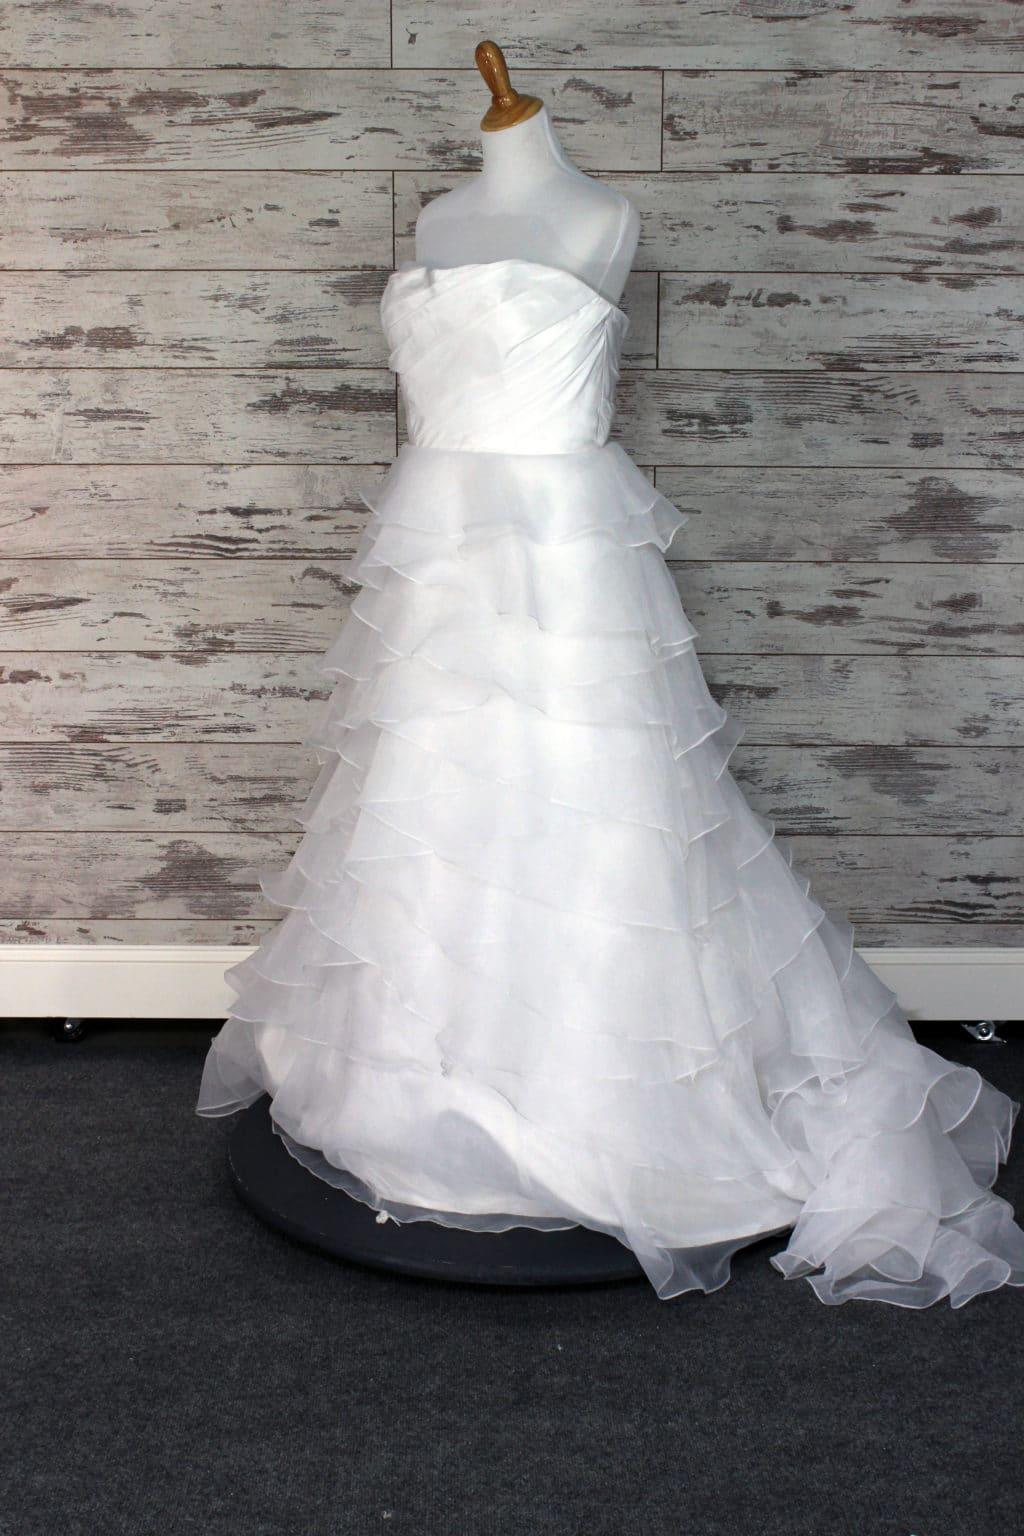 alfred angelo a line wedding dress white size 16. Black Bedroom Furniture Sets. Home Design Ideas